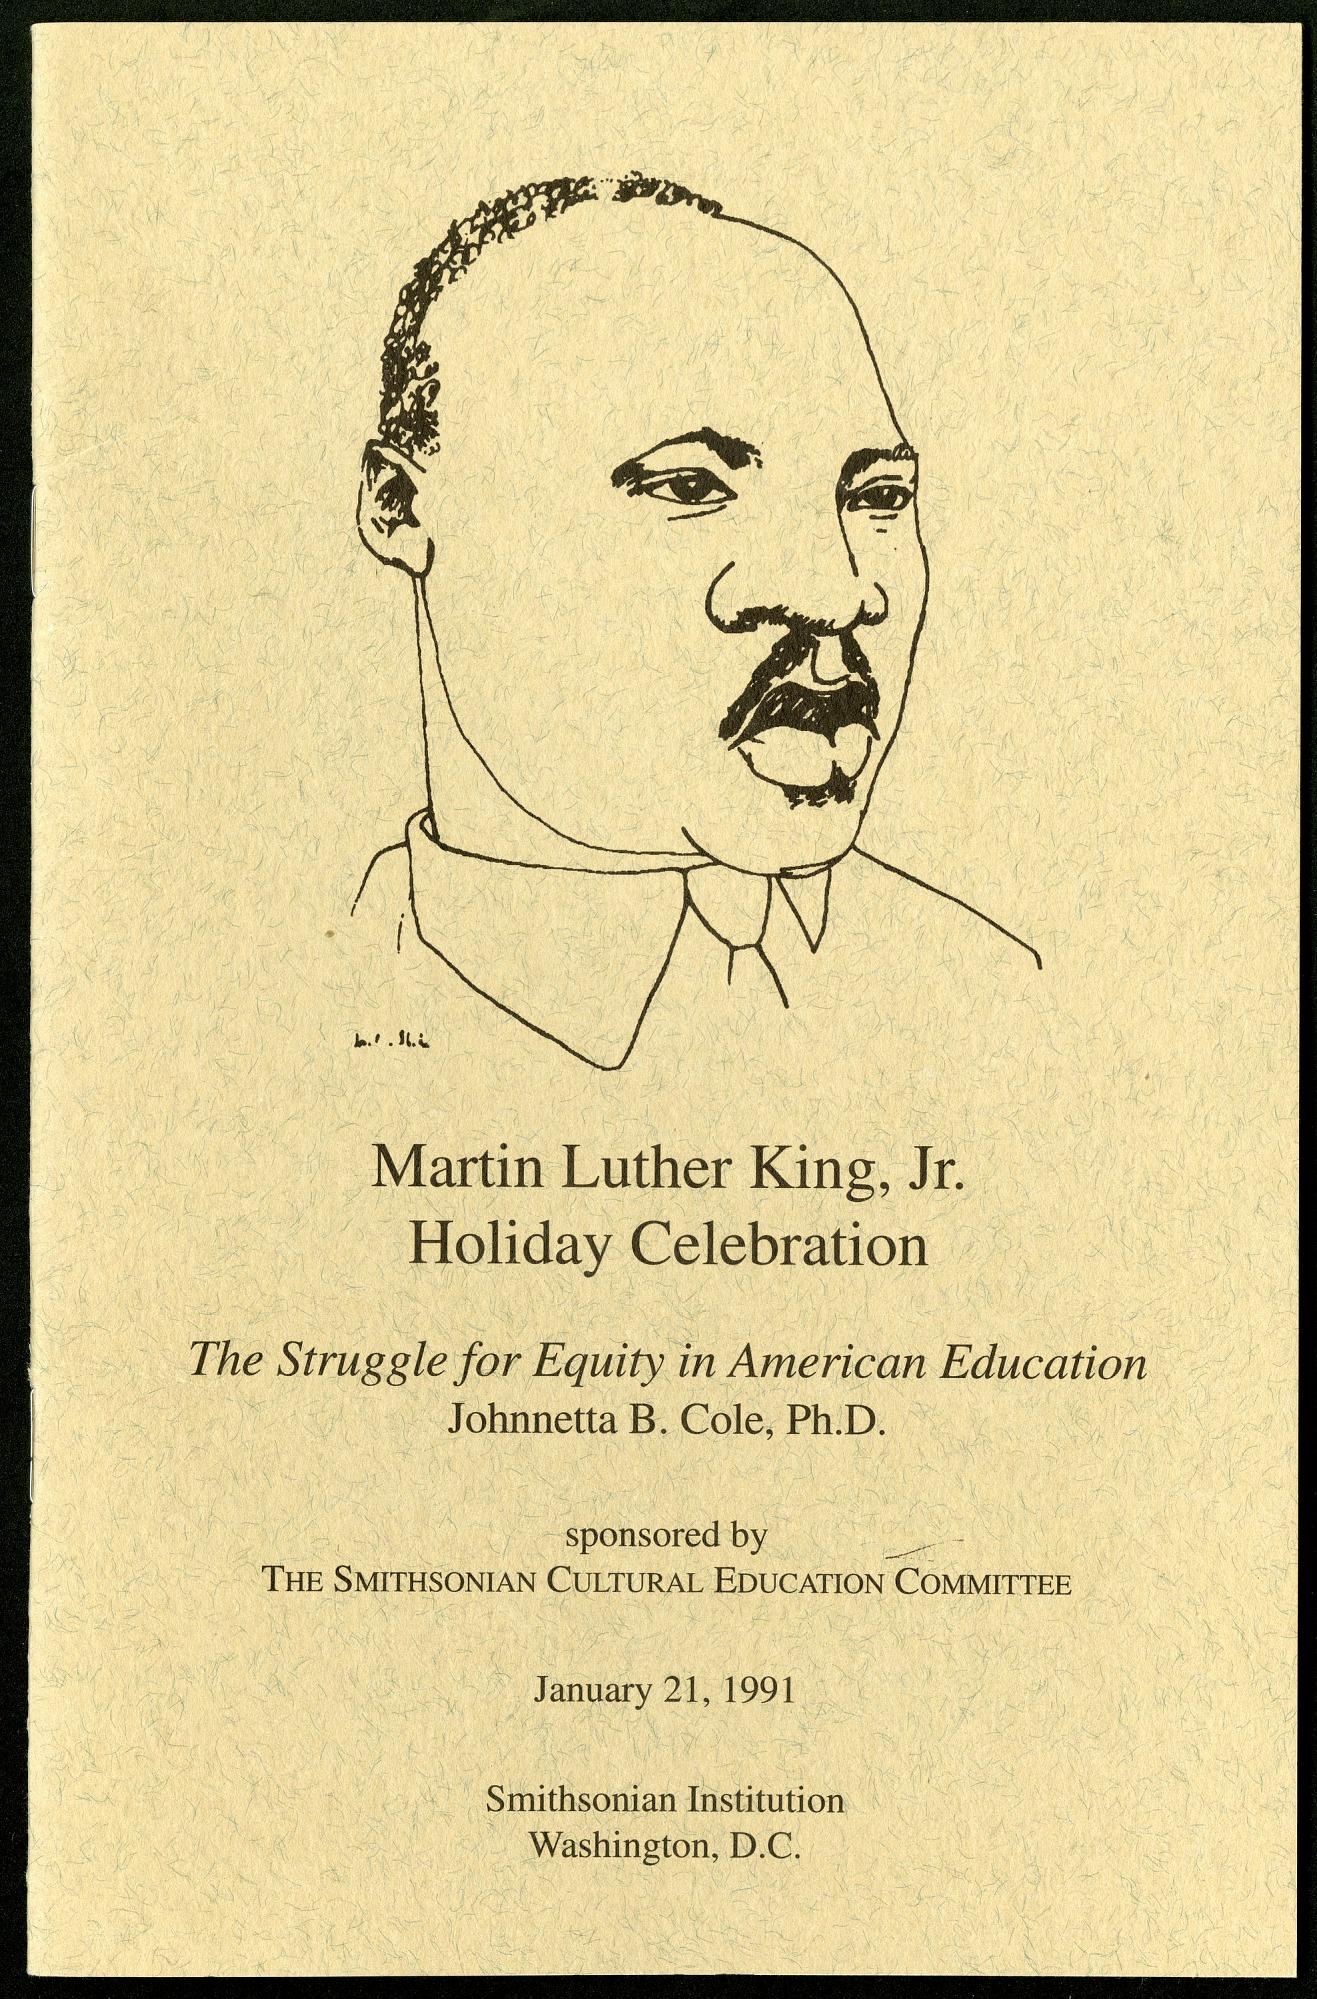 King Holiday Celebration Program, 01/21/1991